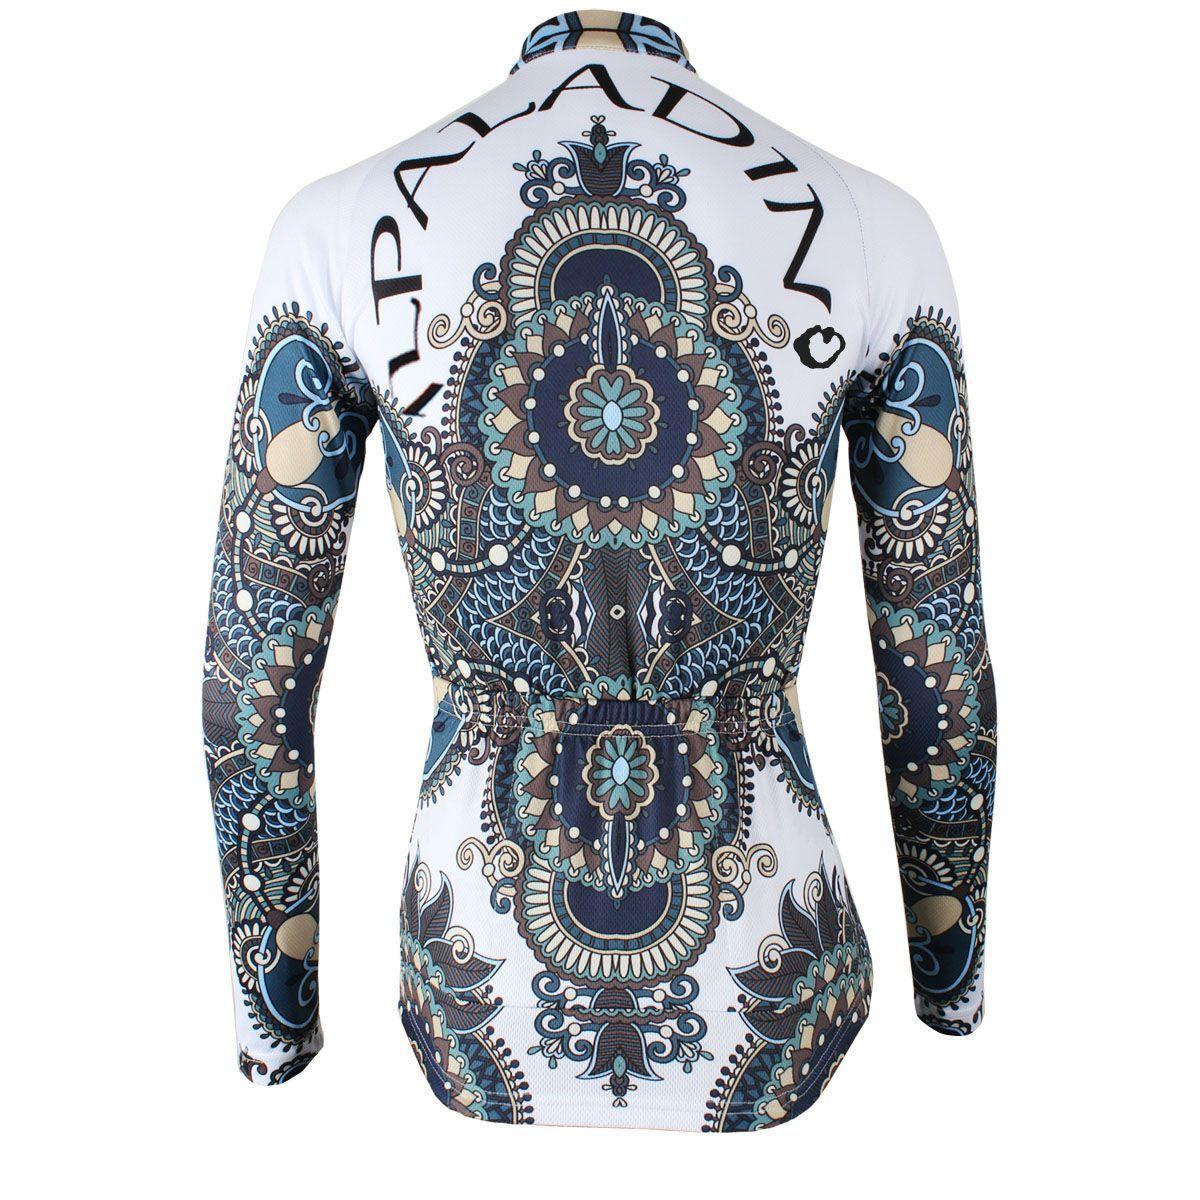 Mountain Bike Apparel,cycling apparel brands,cycling ...